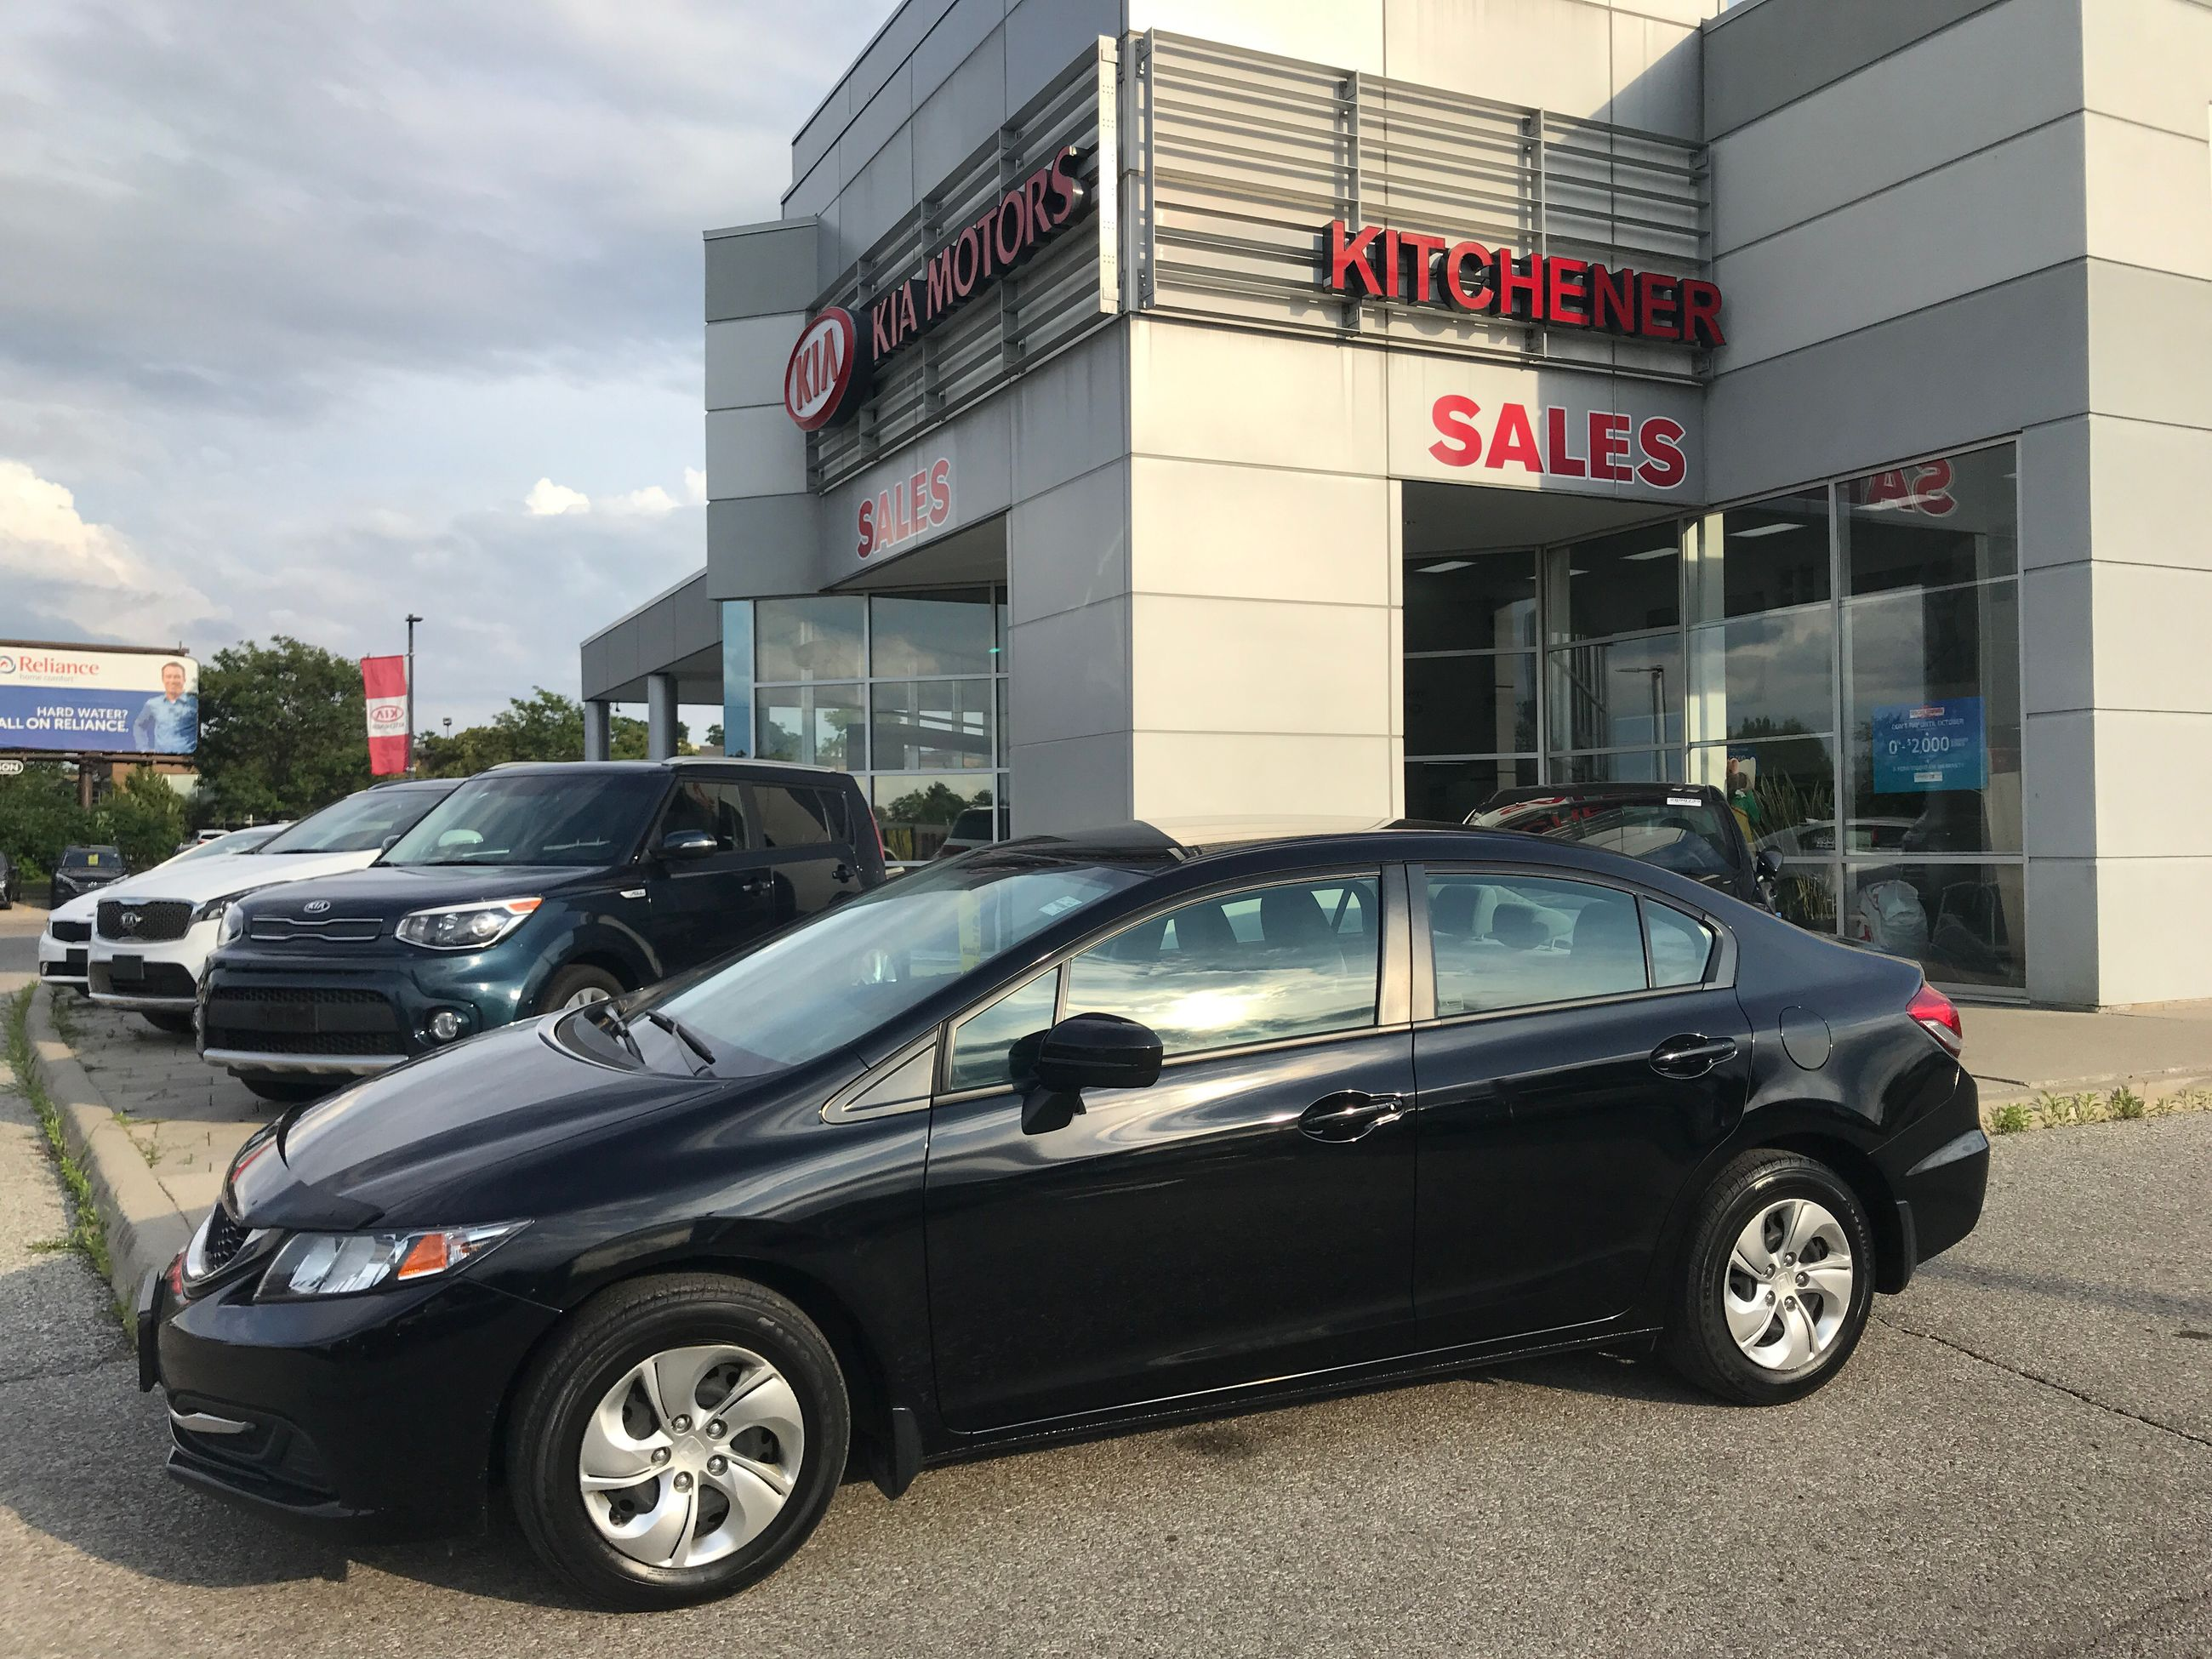 Used 2014 Honda Civic Sedan Lx Cvt For Sale 12600 0 Kitchener Kia